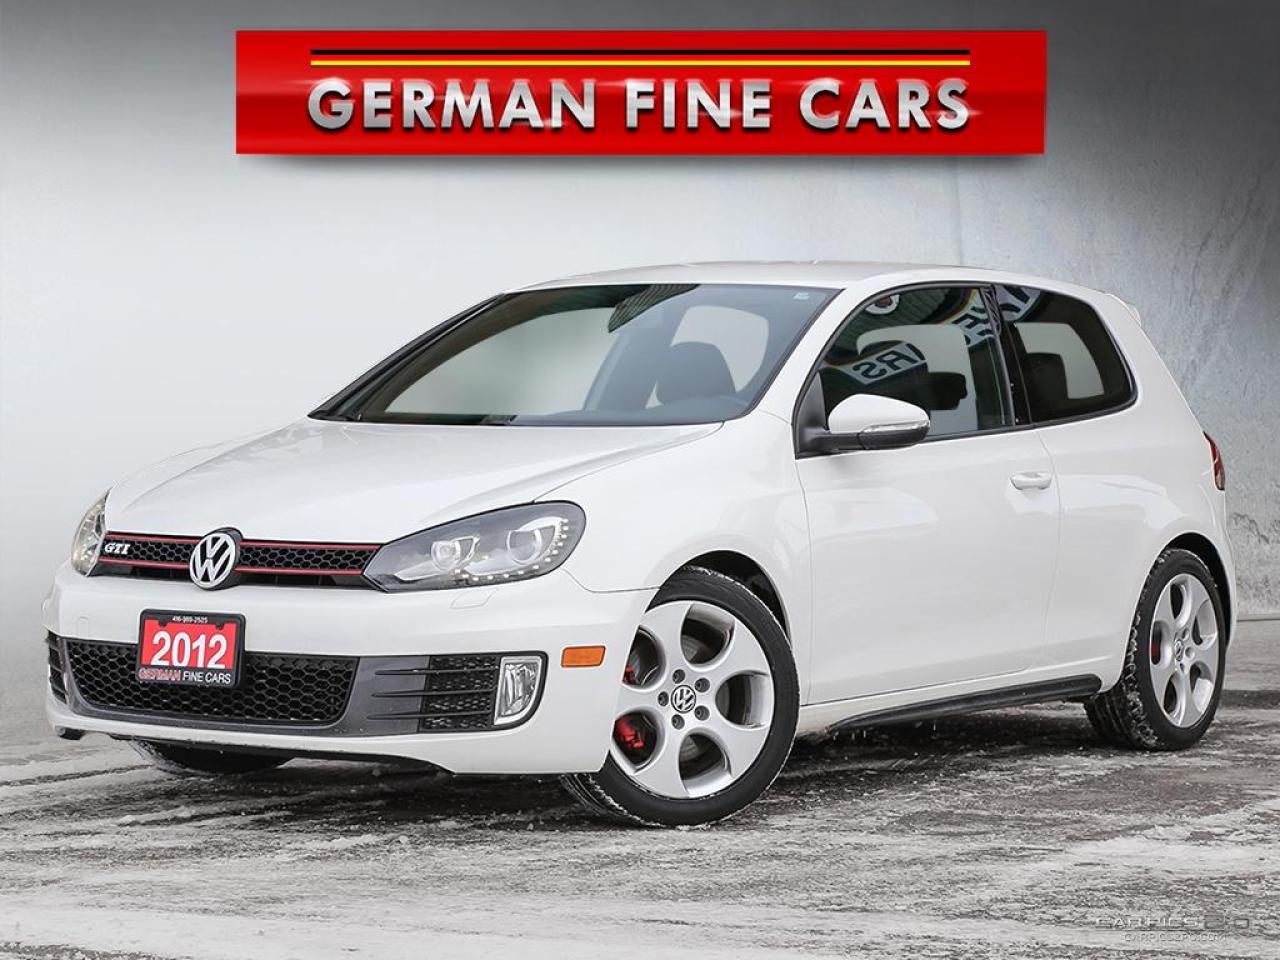 2012 Volkswagen GTI **GTI GAS TURBO, BLUETOOTH, SATELLITE RADIO**